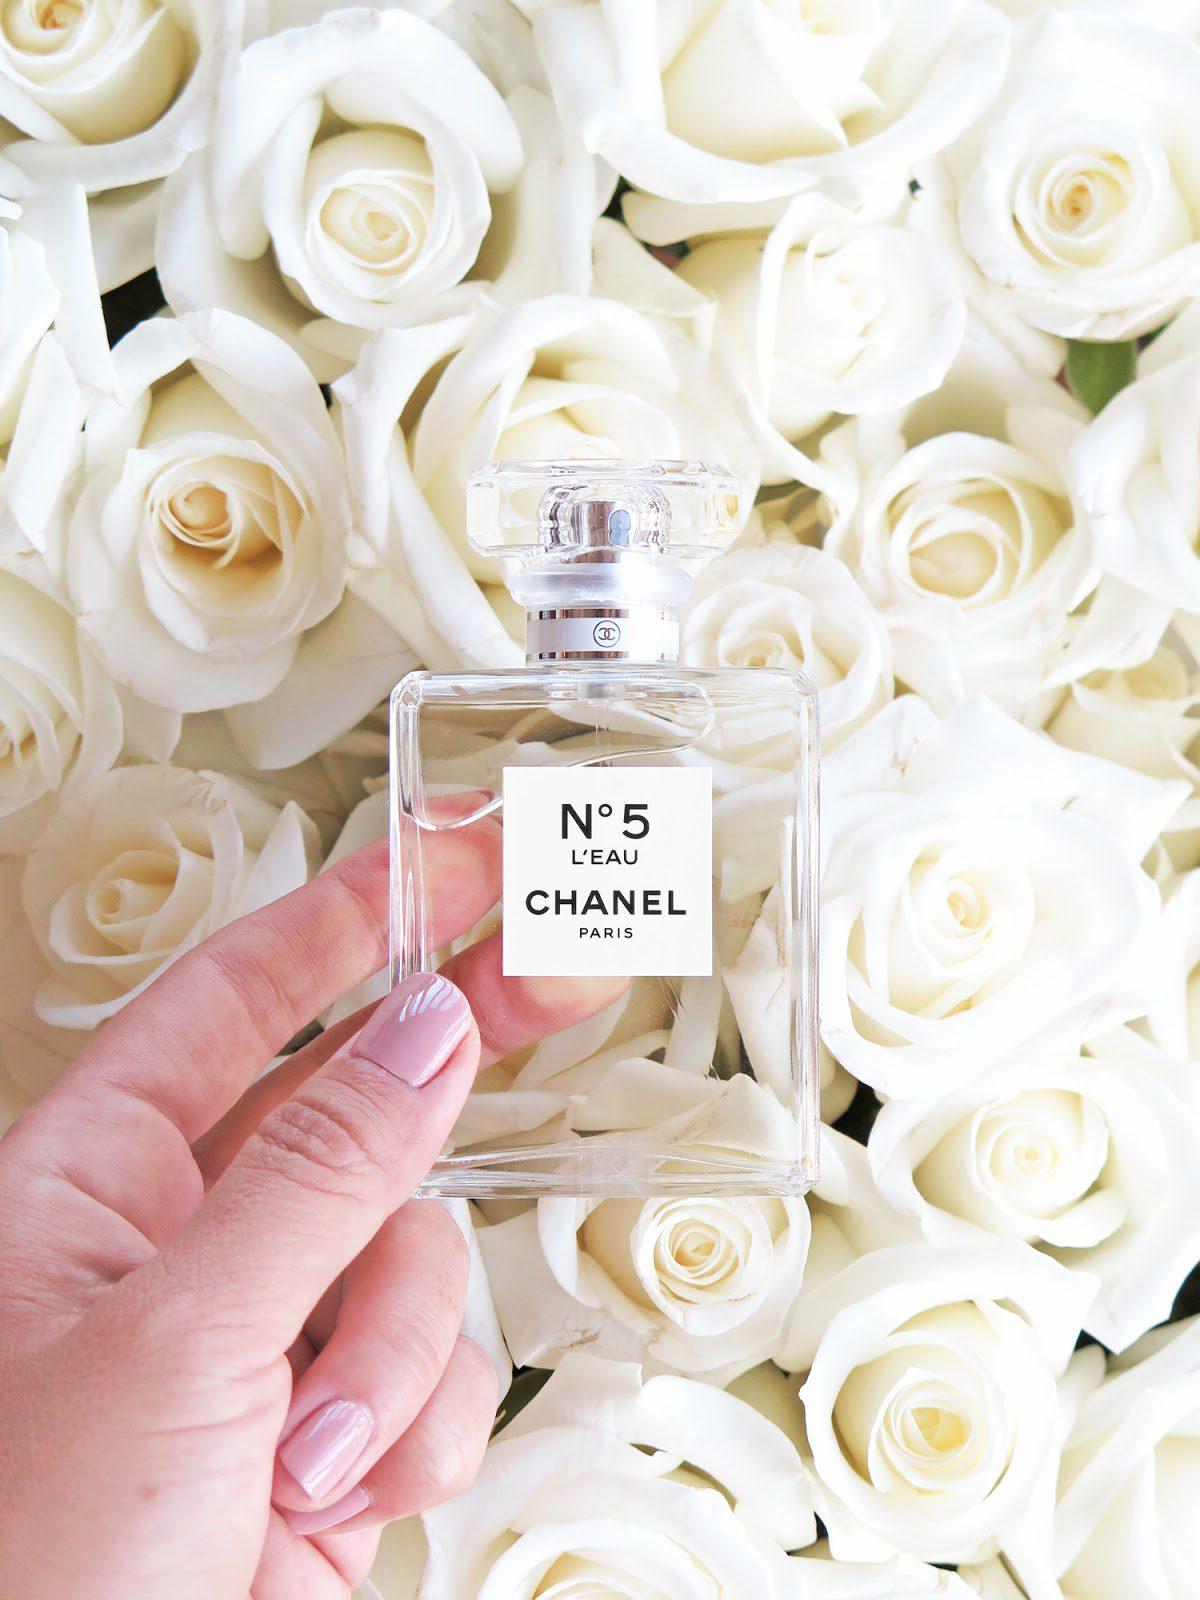 Chanel N°5 L'Eau Perfume